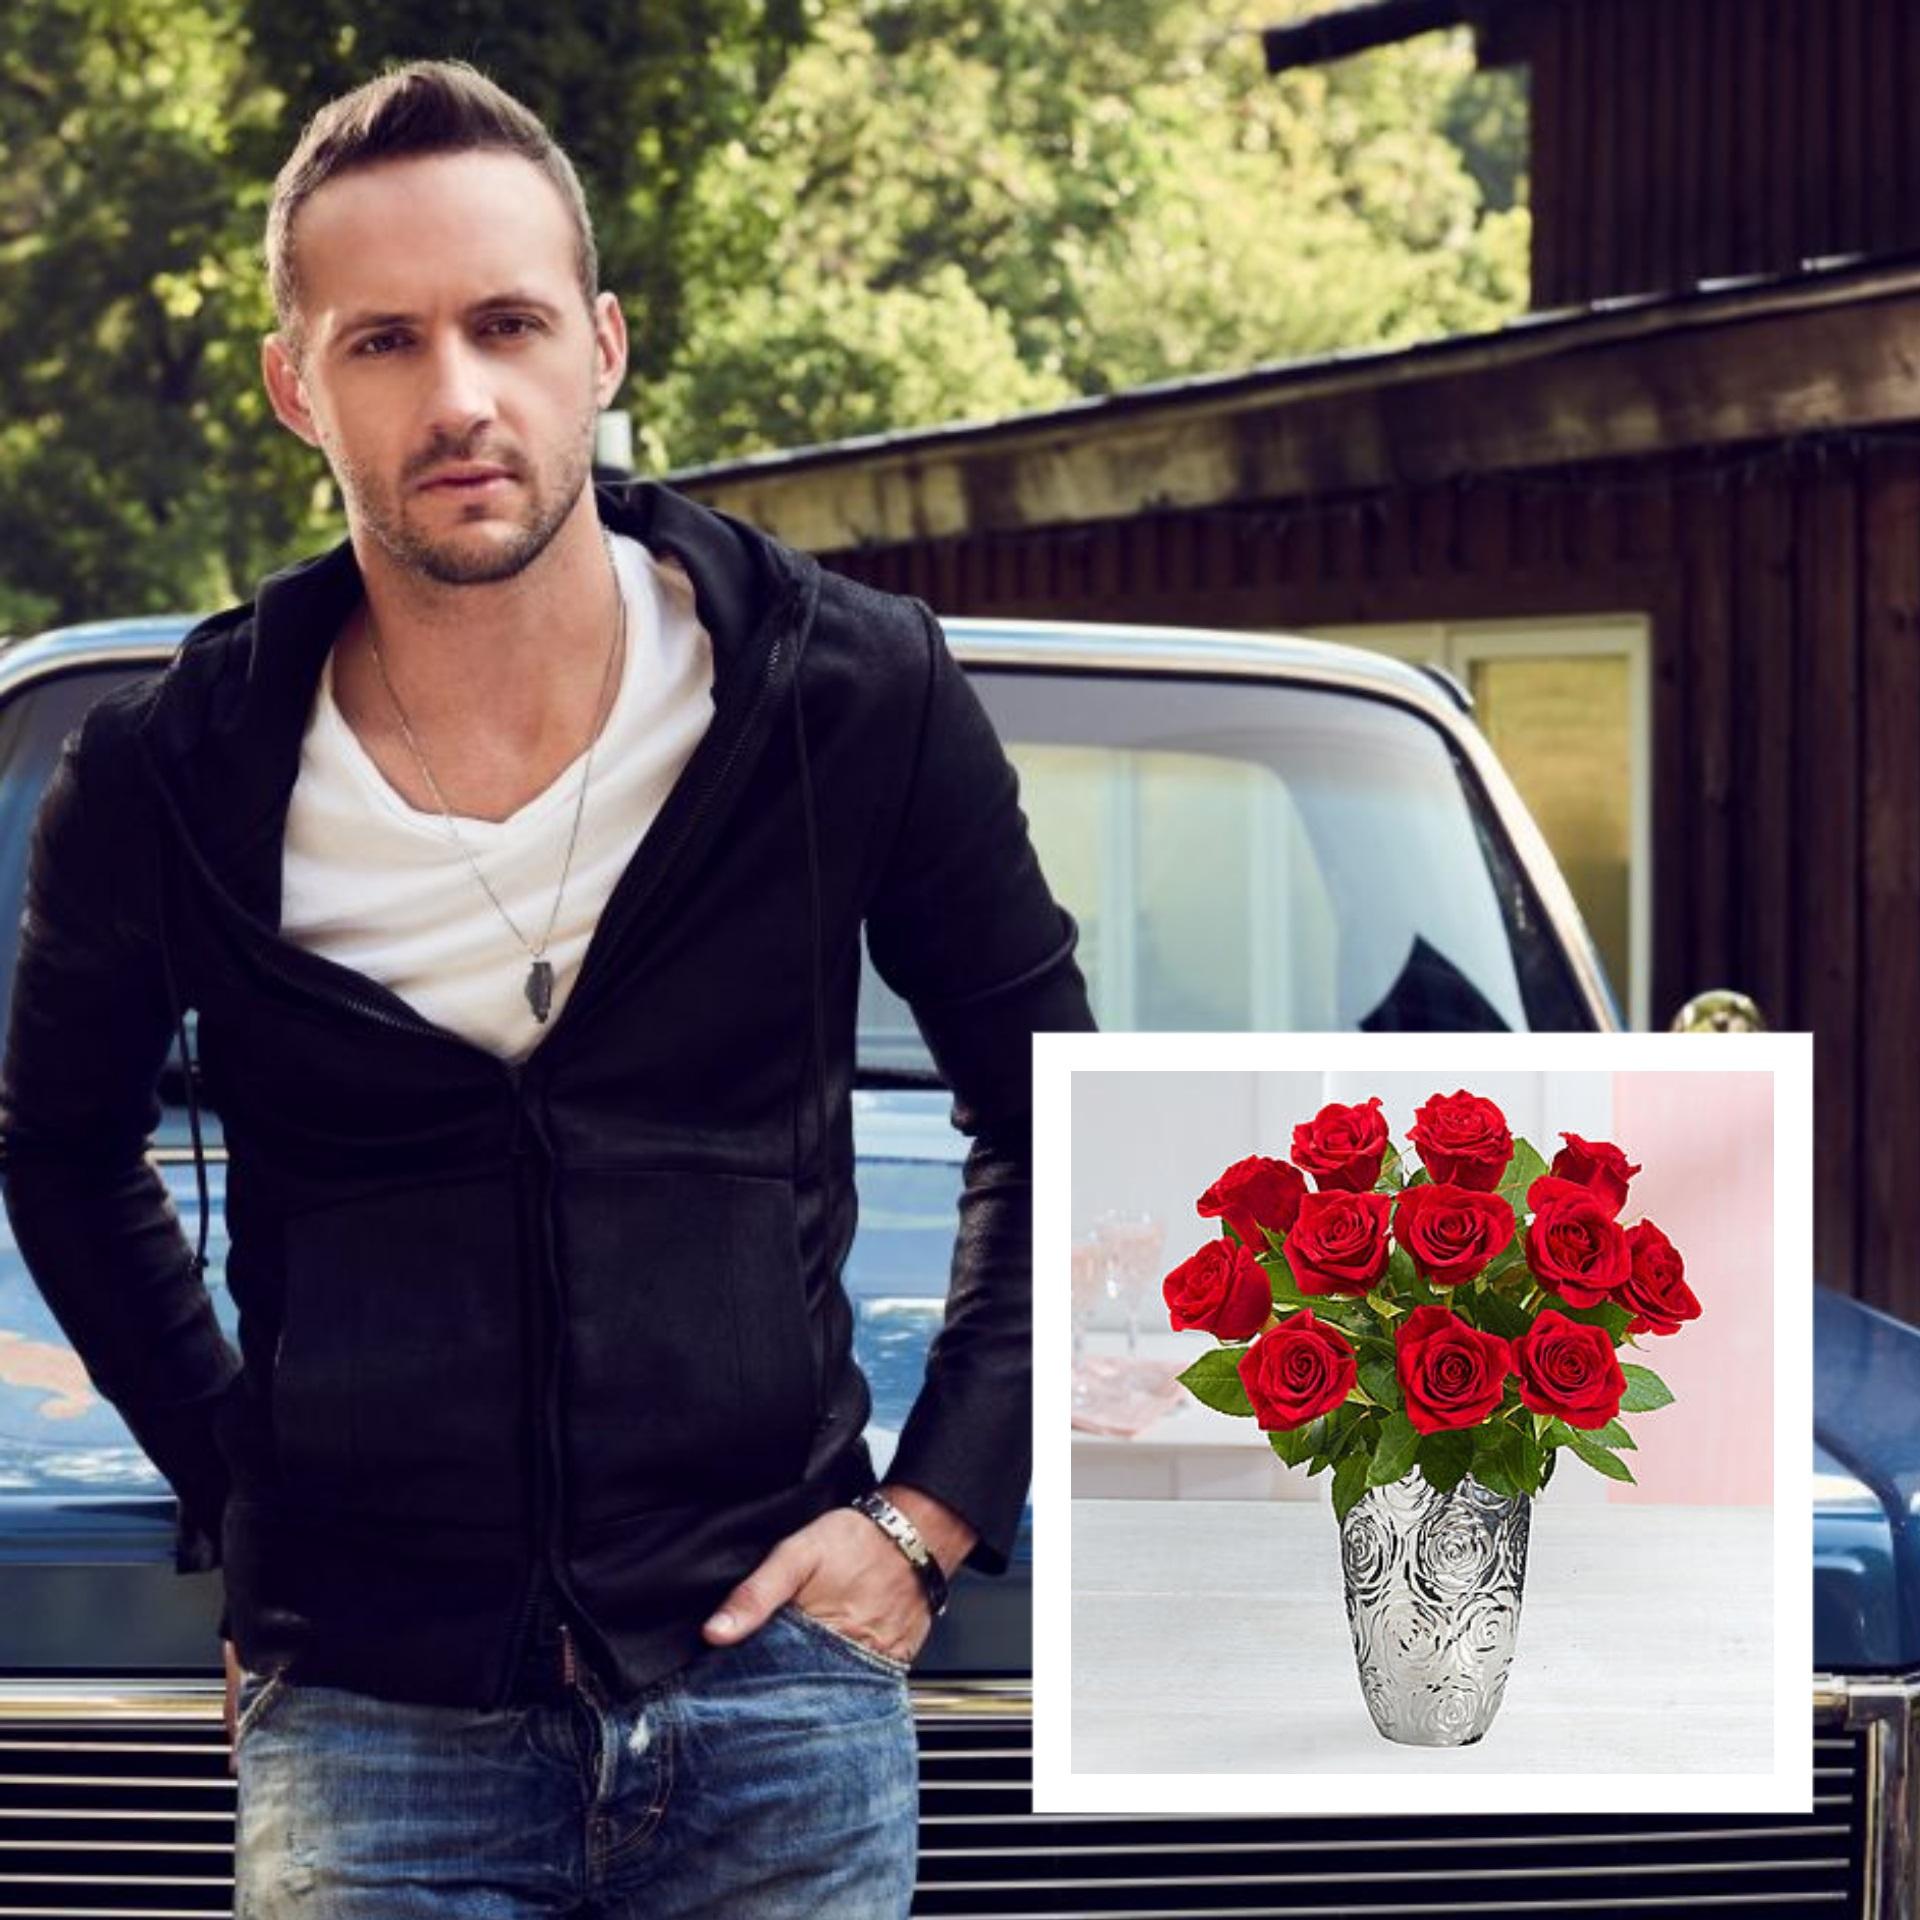 WIN a 1 800 Flowers Guns & Roses Bouquet From Drew Baldridge